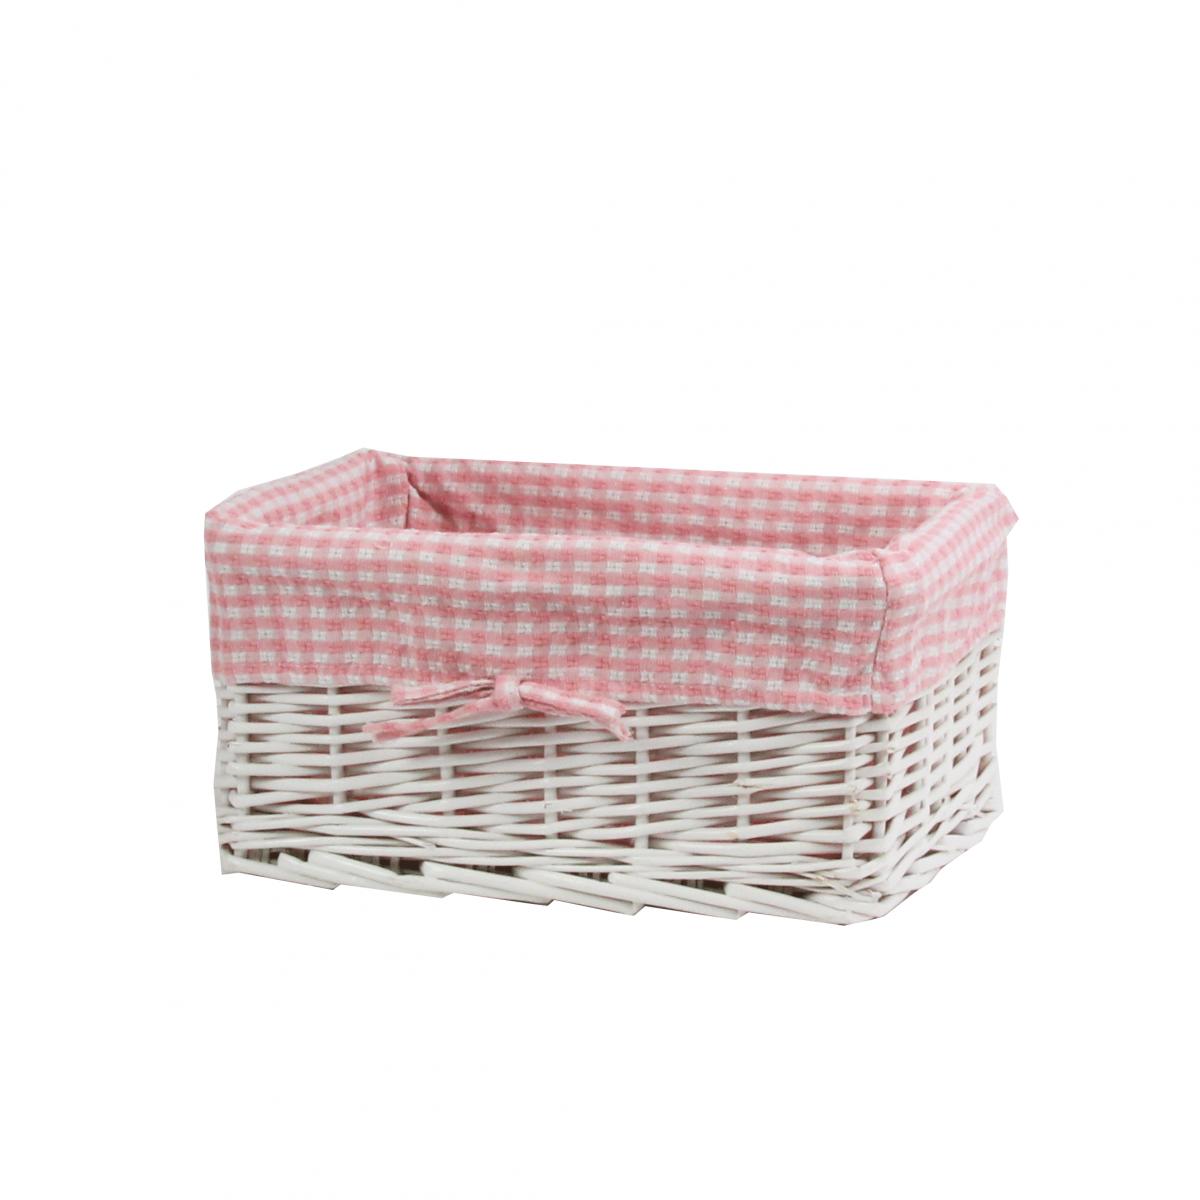 Panier de rangement en osier blanc et vichy rose for Panier osier rangement salle de bain